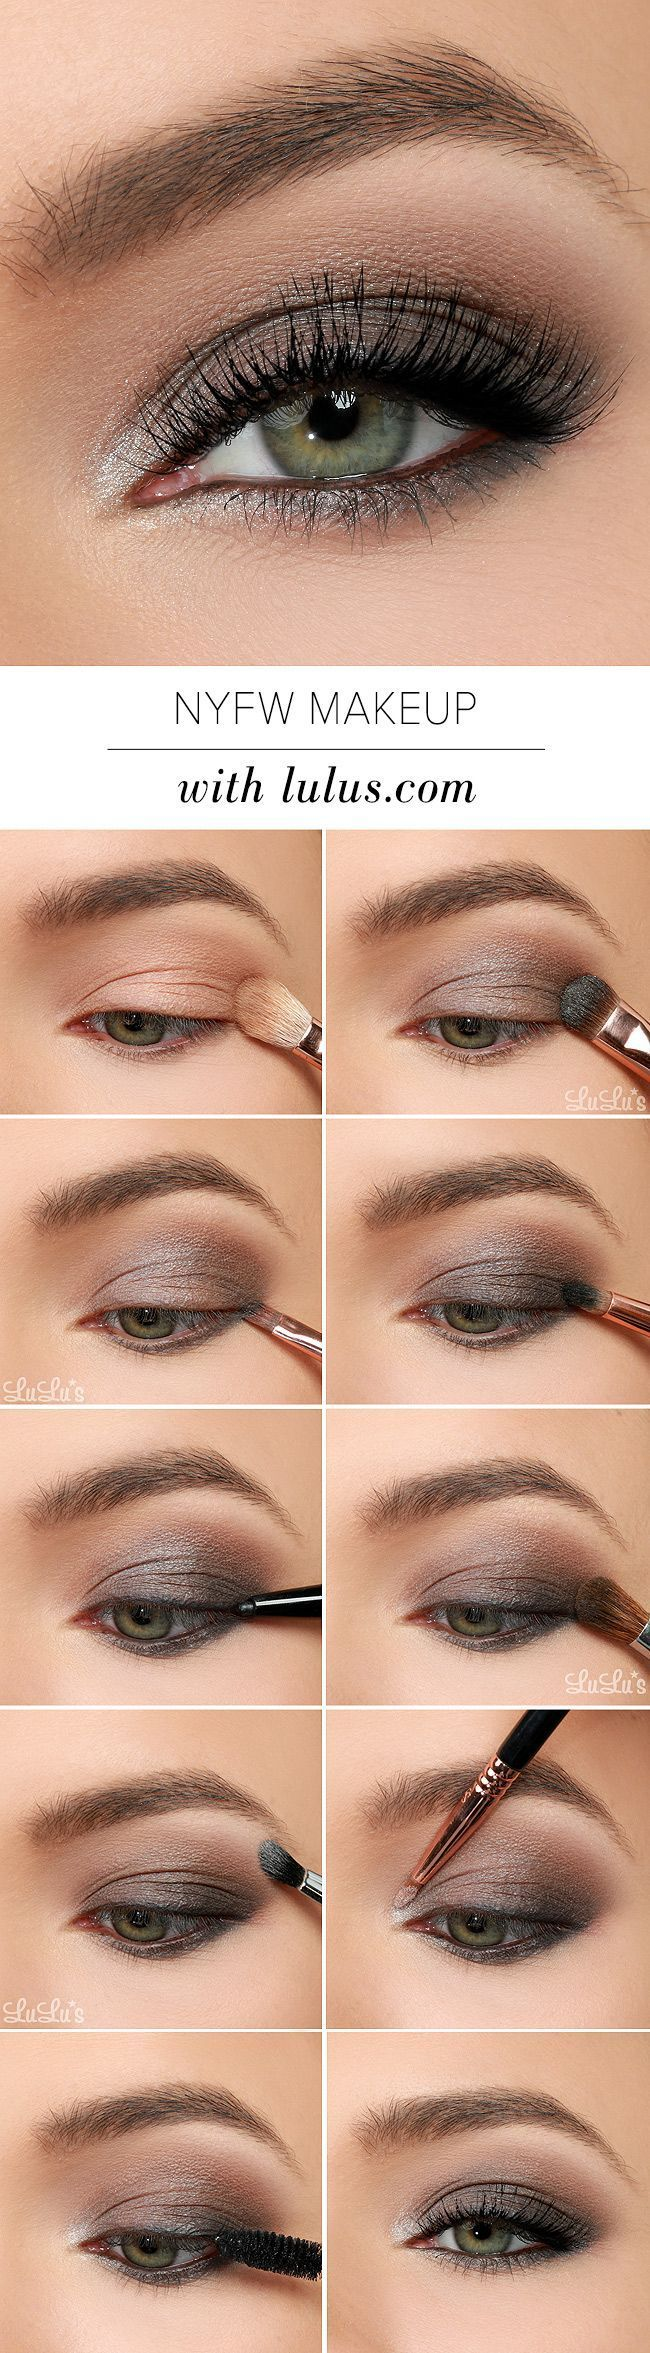 Metallic silver bridal makeup tutorial   fashionisers©.